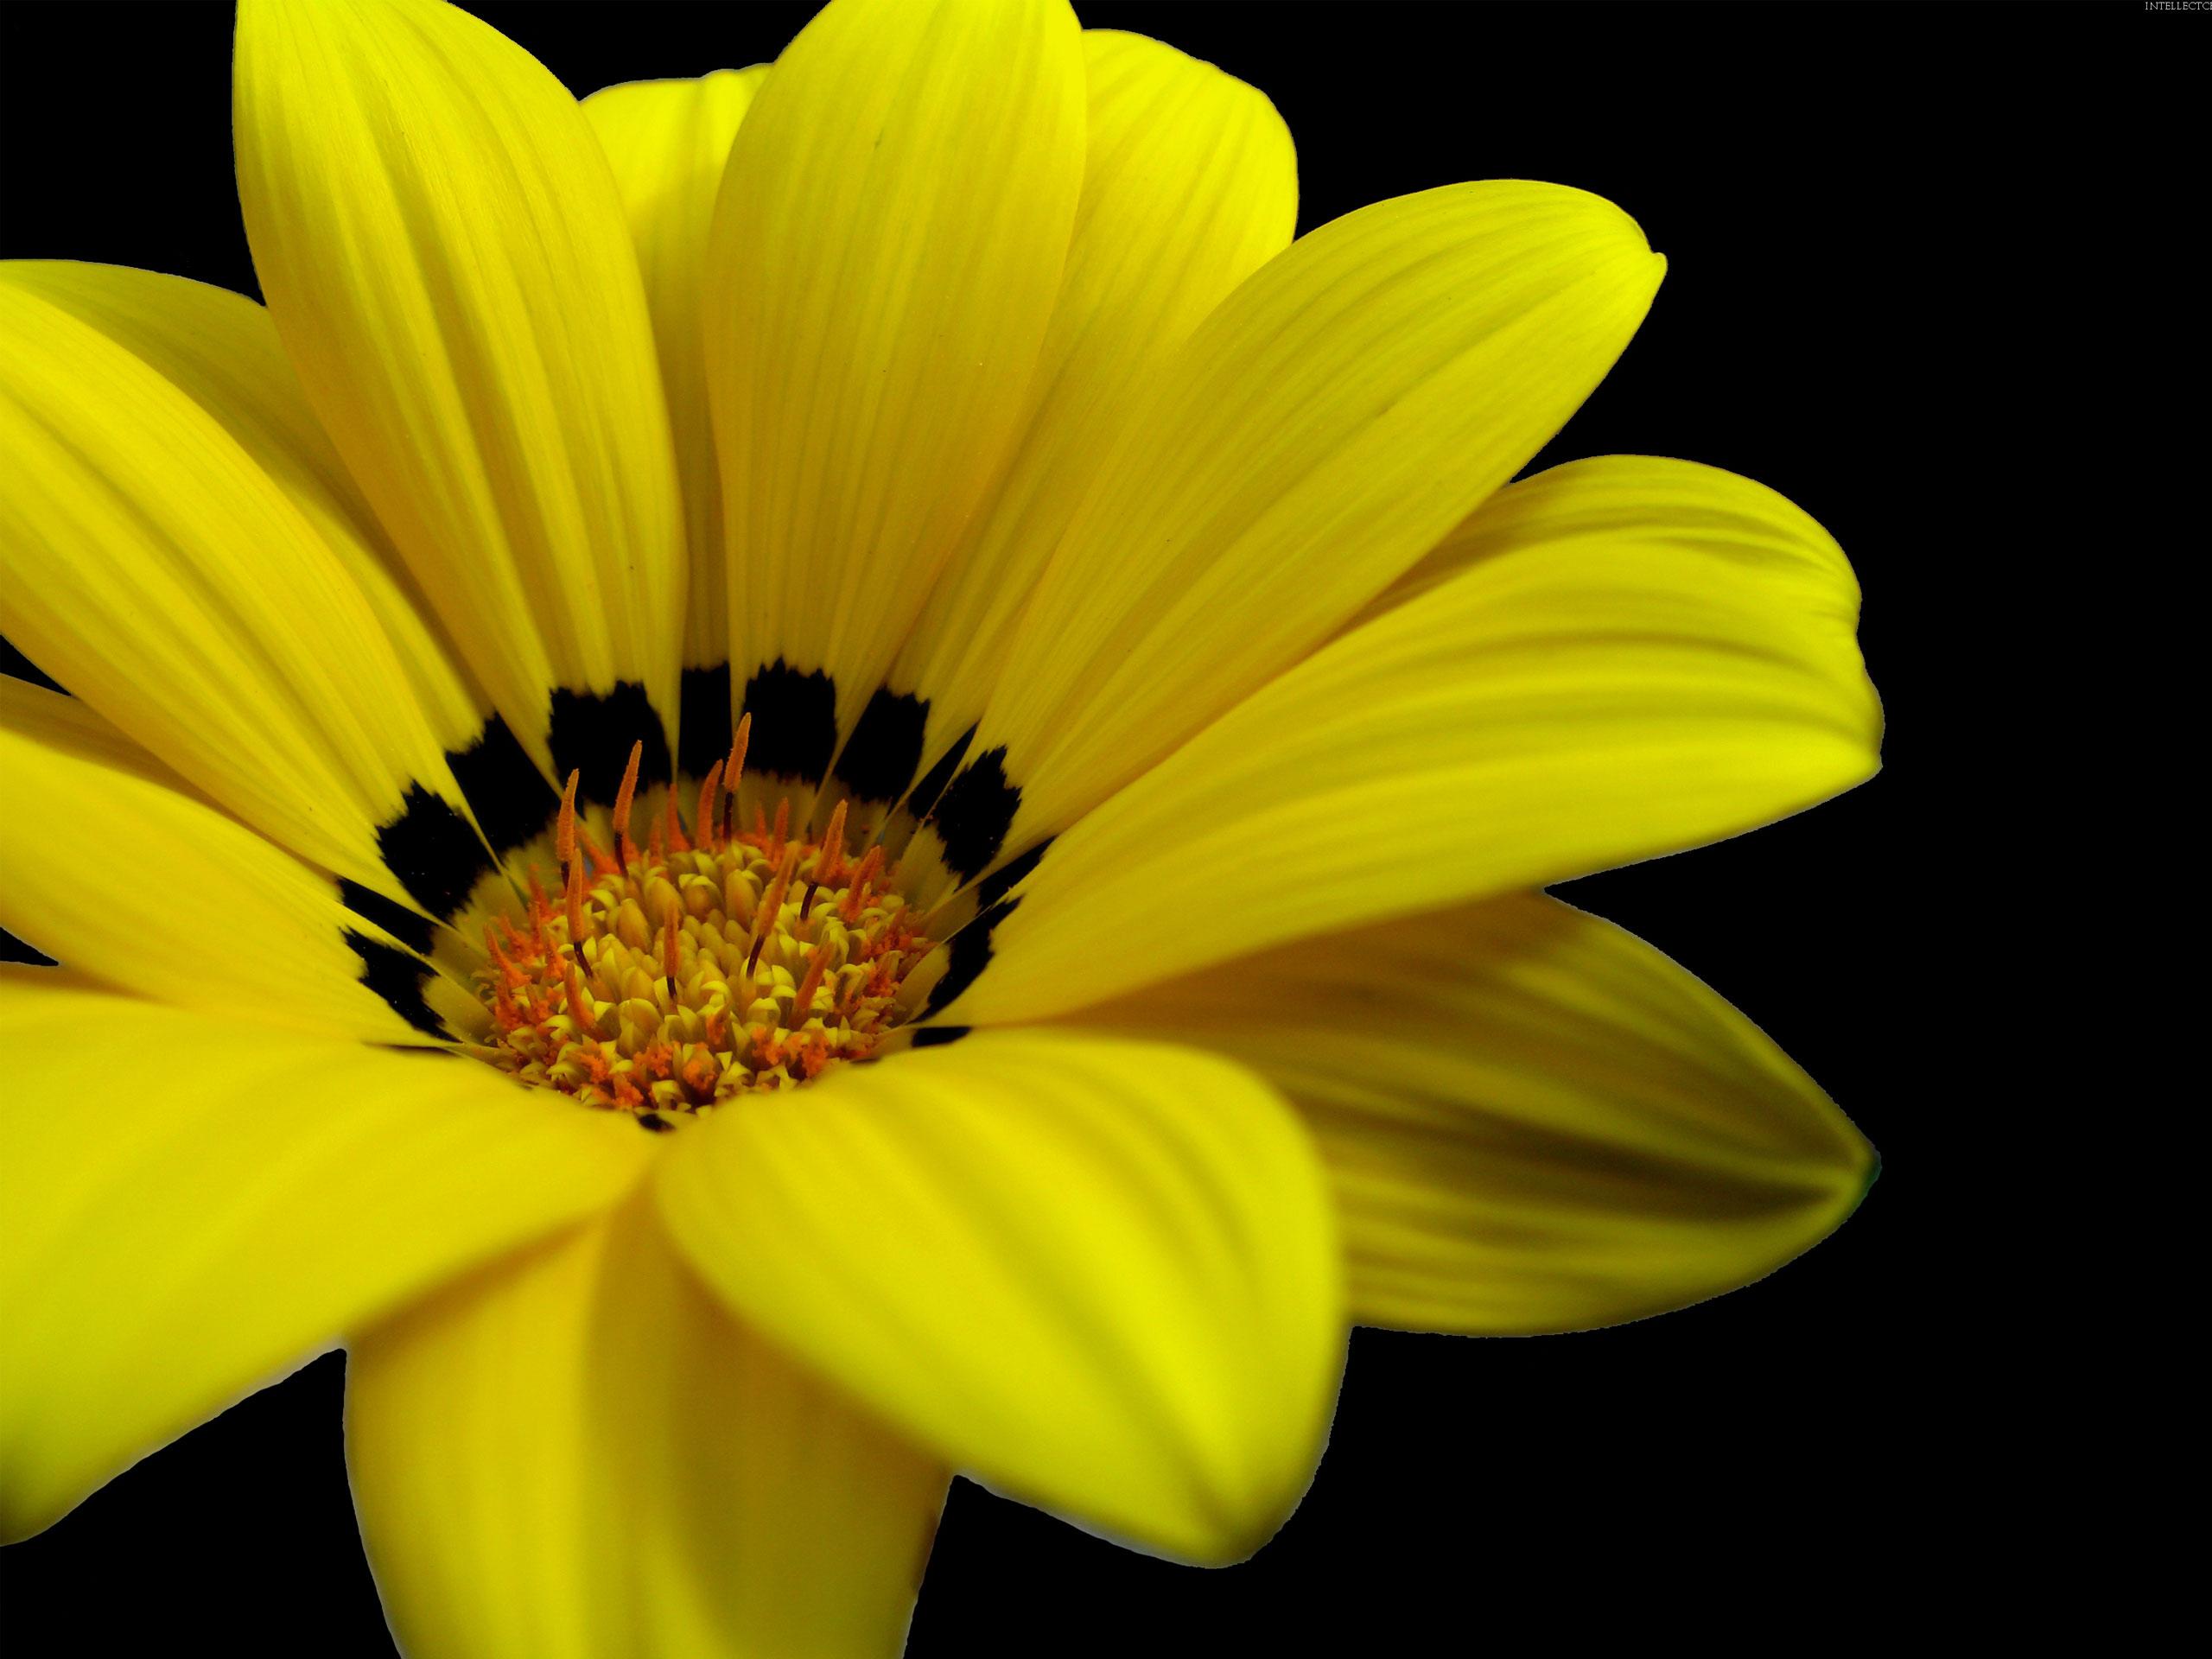 Yellow flowers 14146 2560x1920 px hdwallsource yellow flowers 14146 mightylinksfo Choice Image